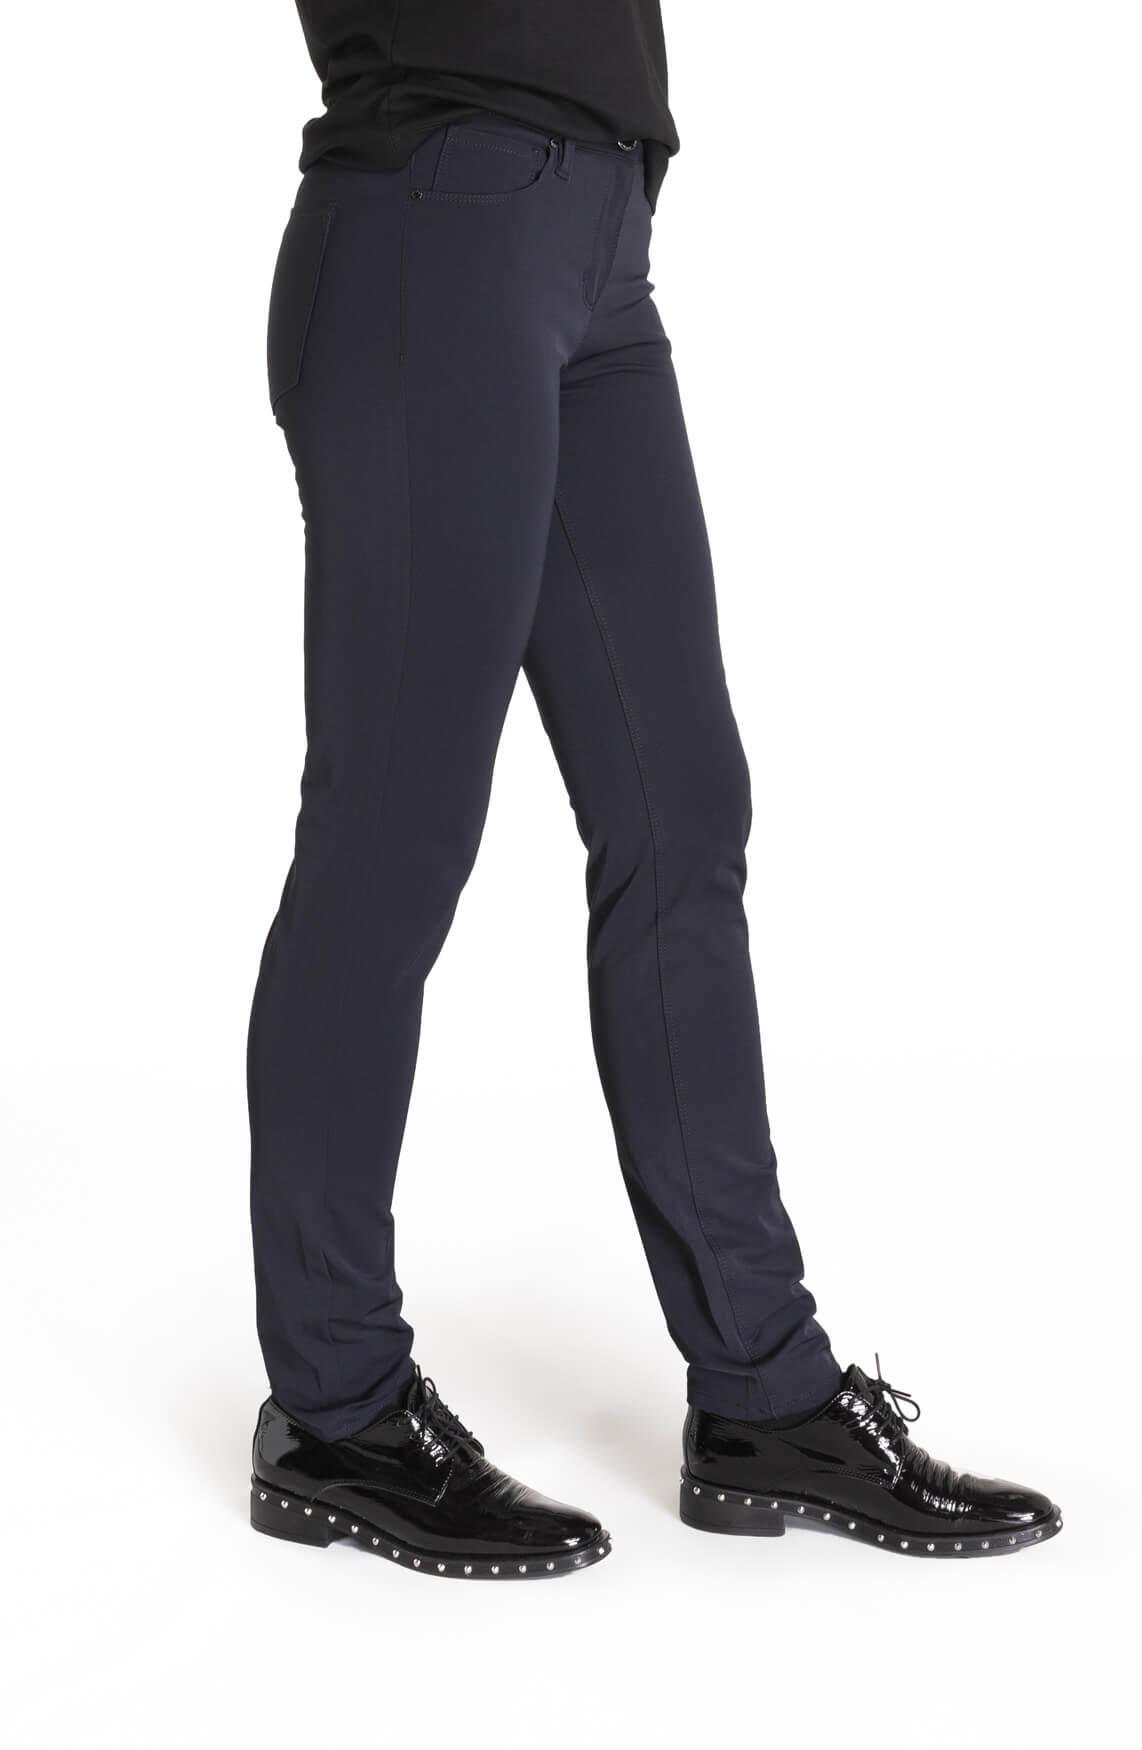 Rosner Dames Alisa pantalon marine 0